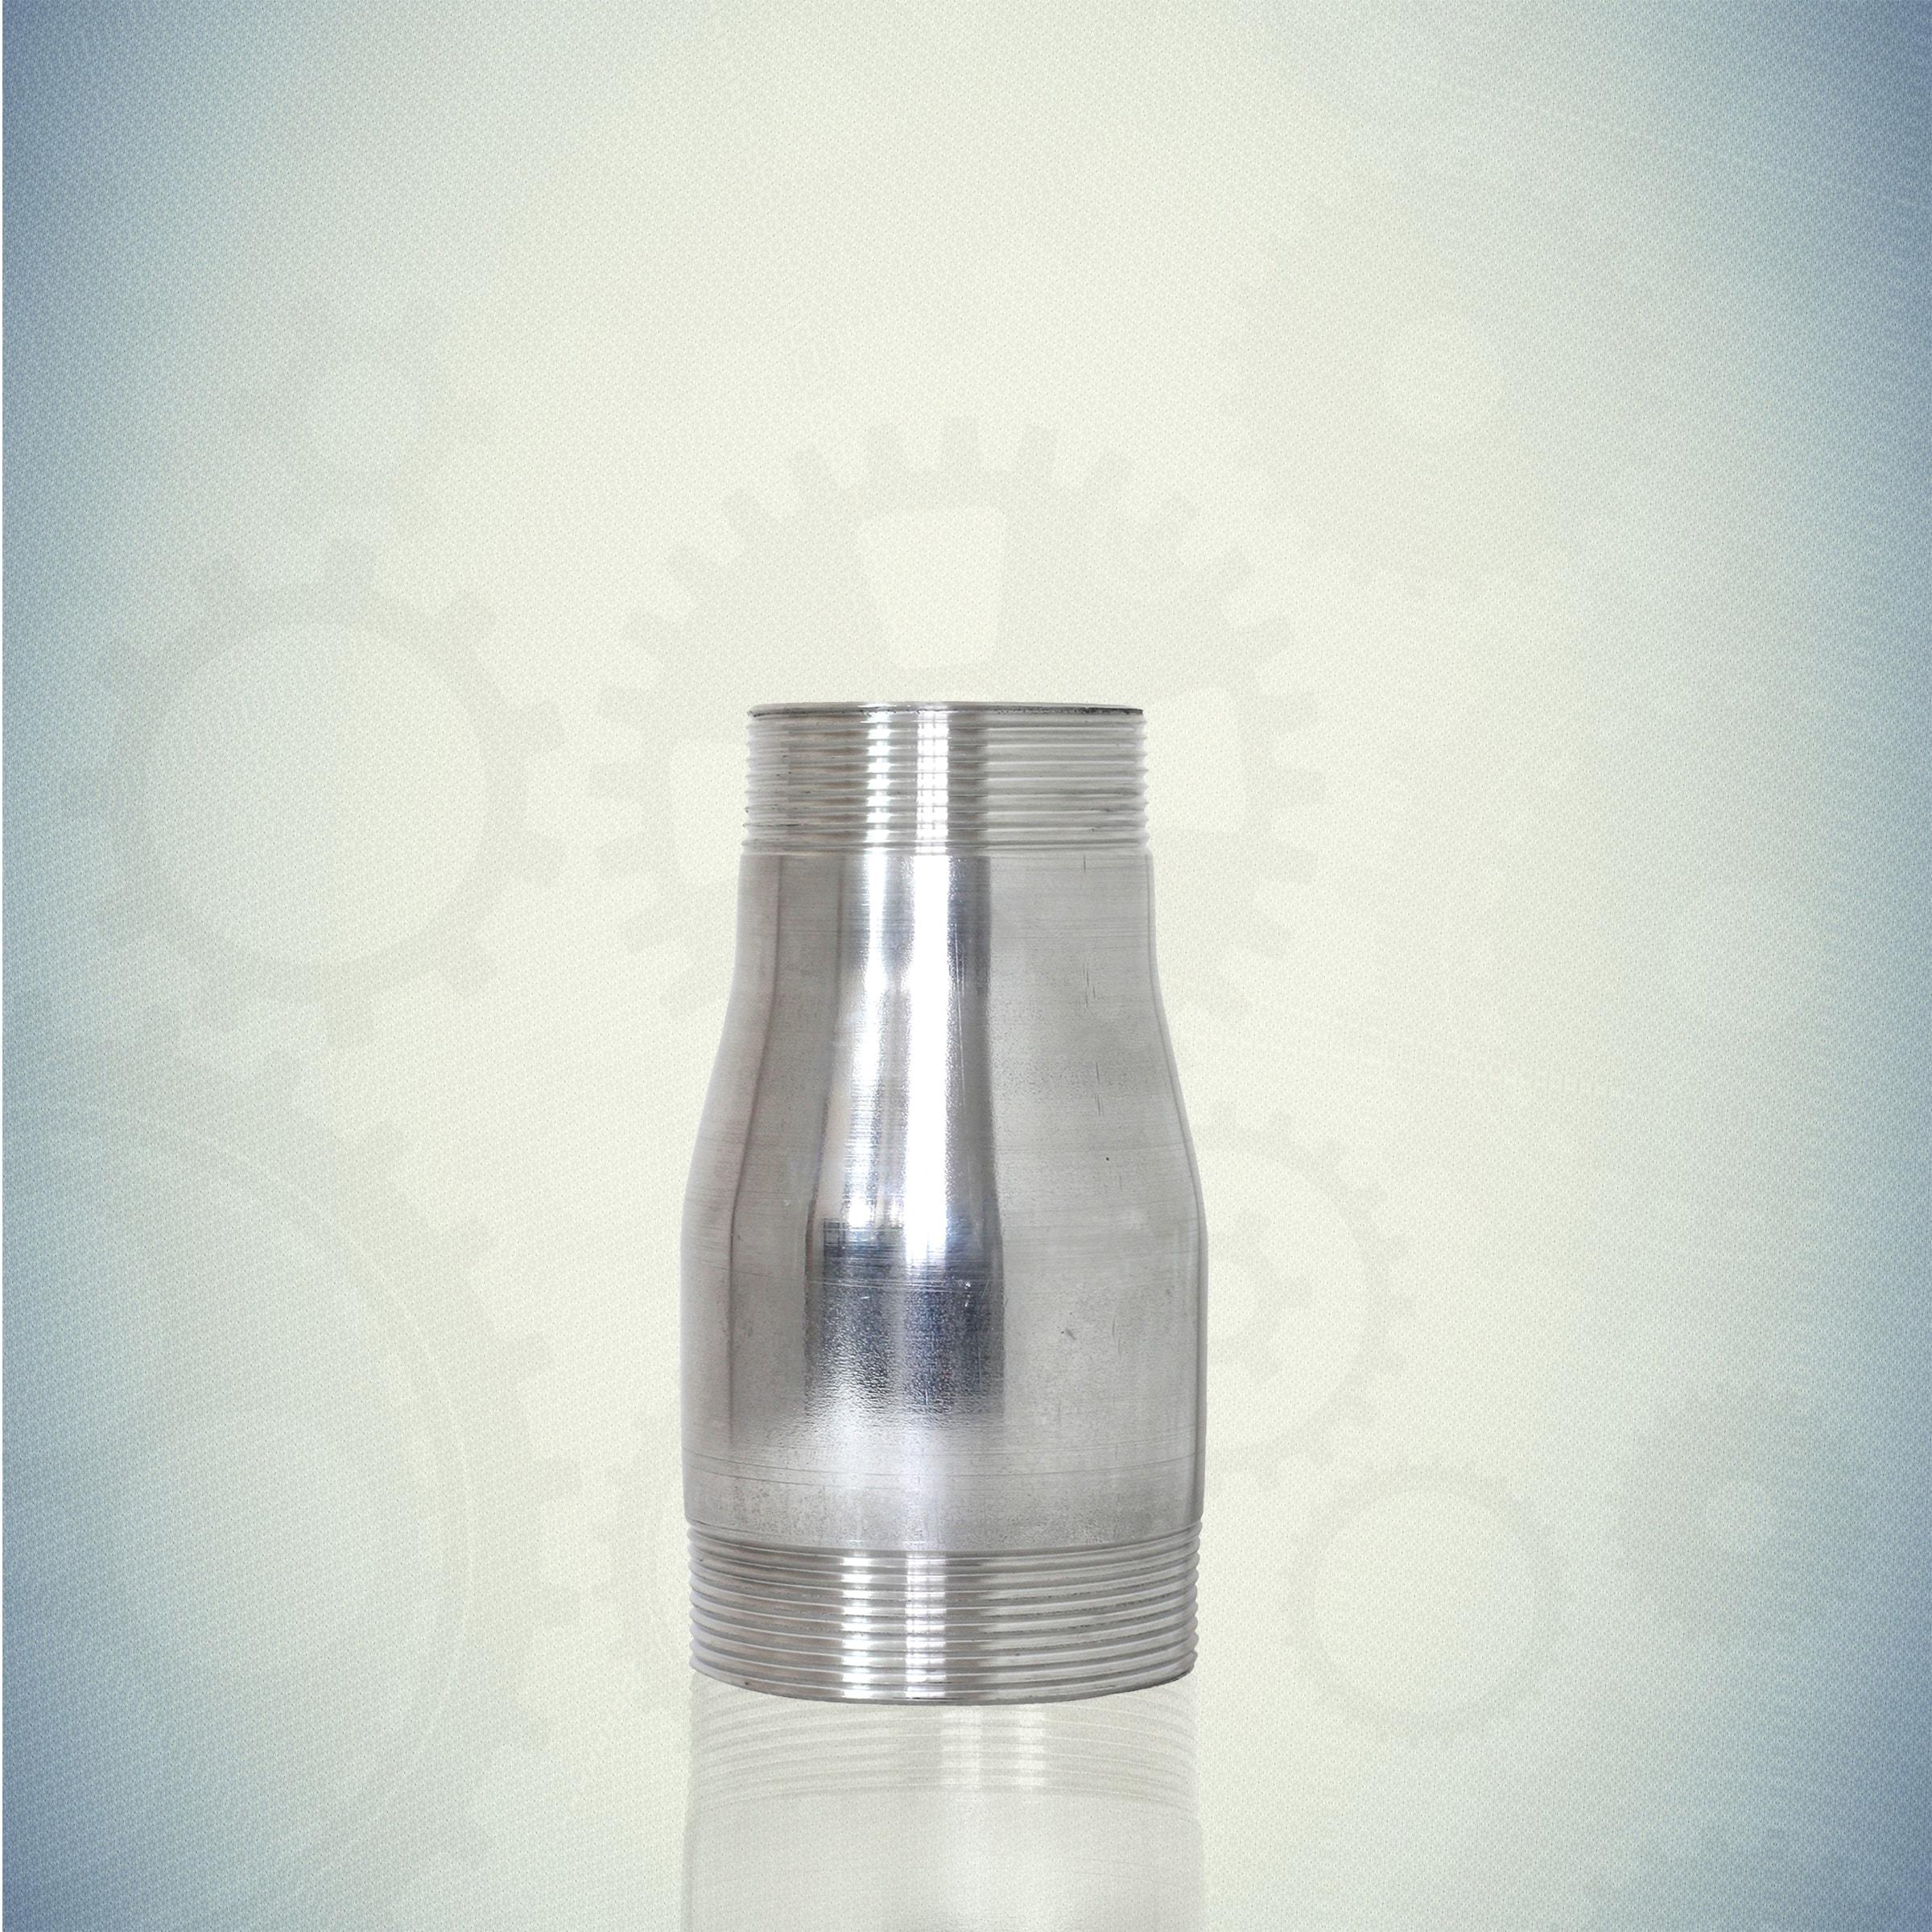 Stainless Steel Shambhu Nipple Manufacturer in India